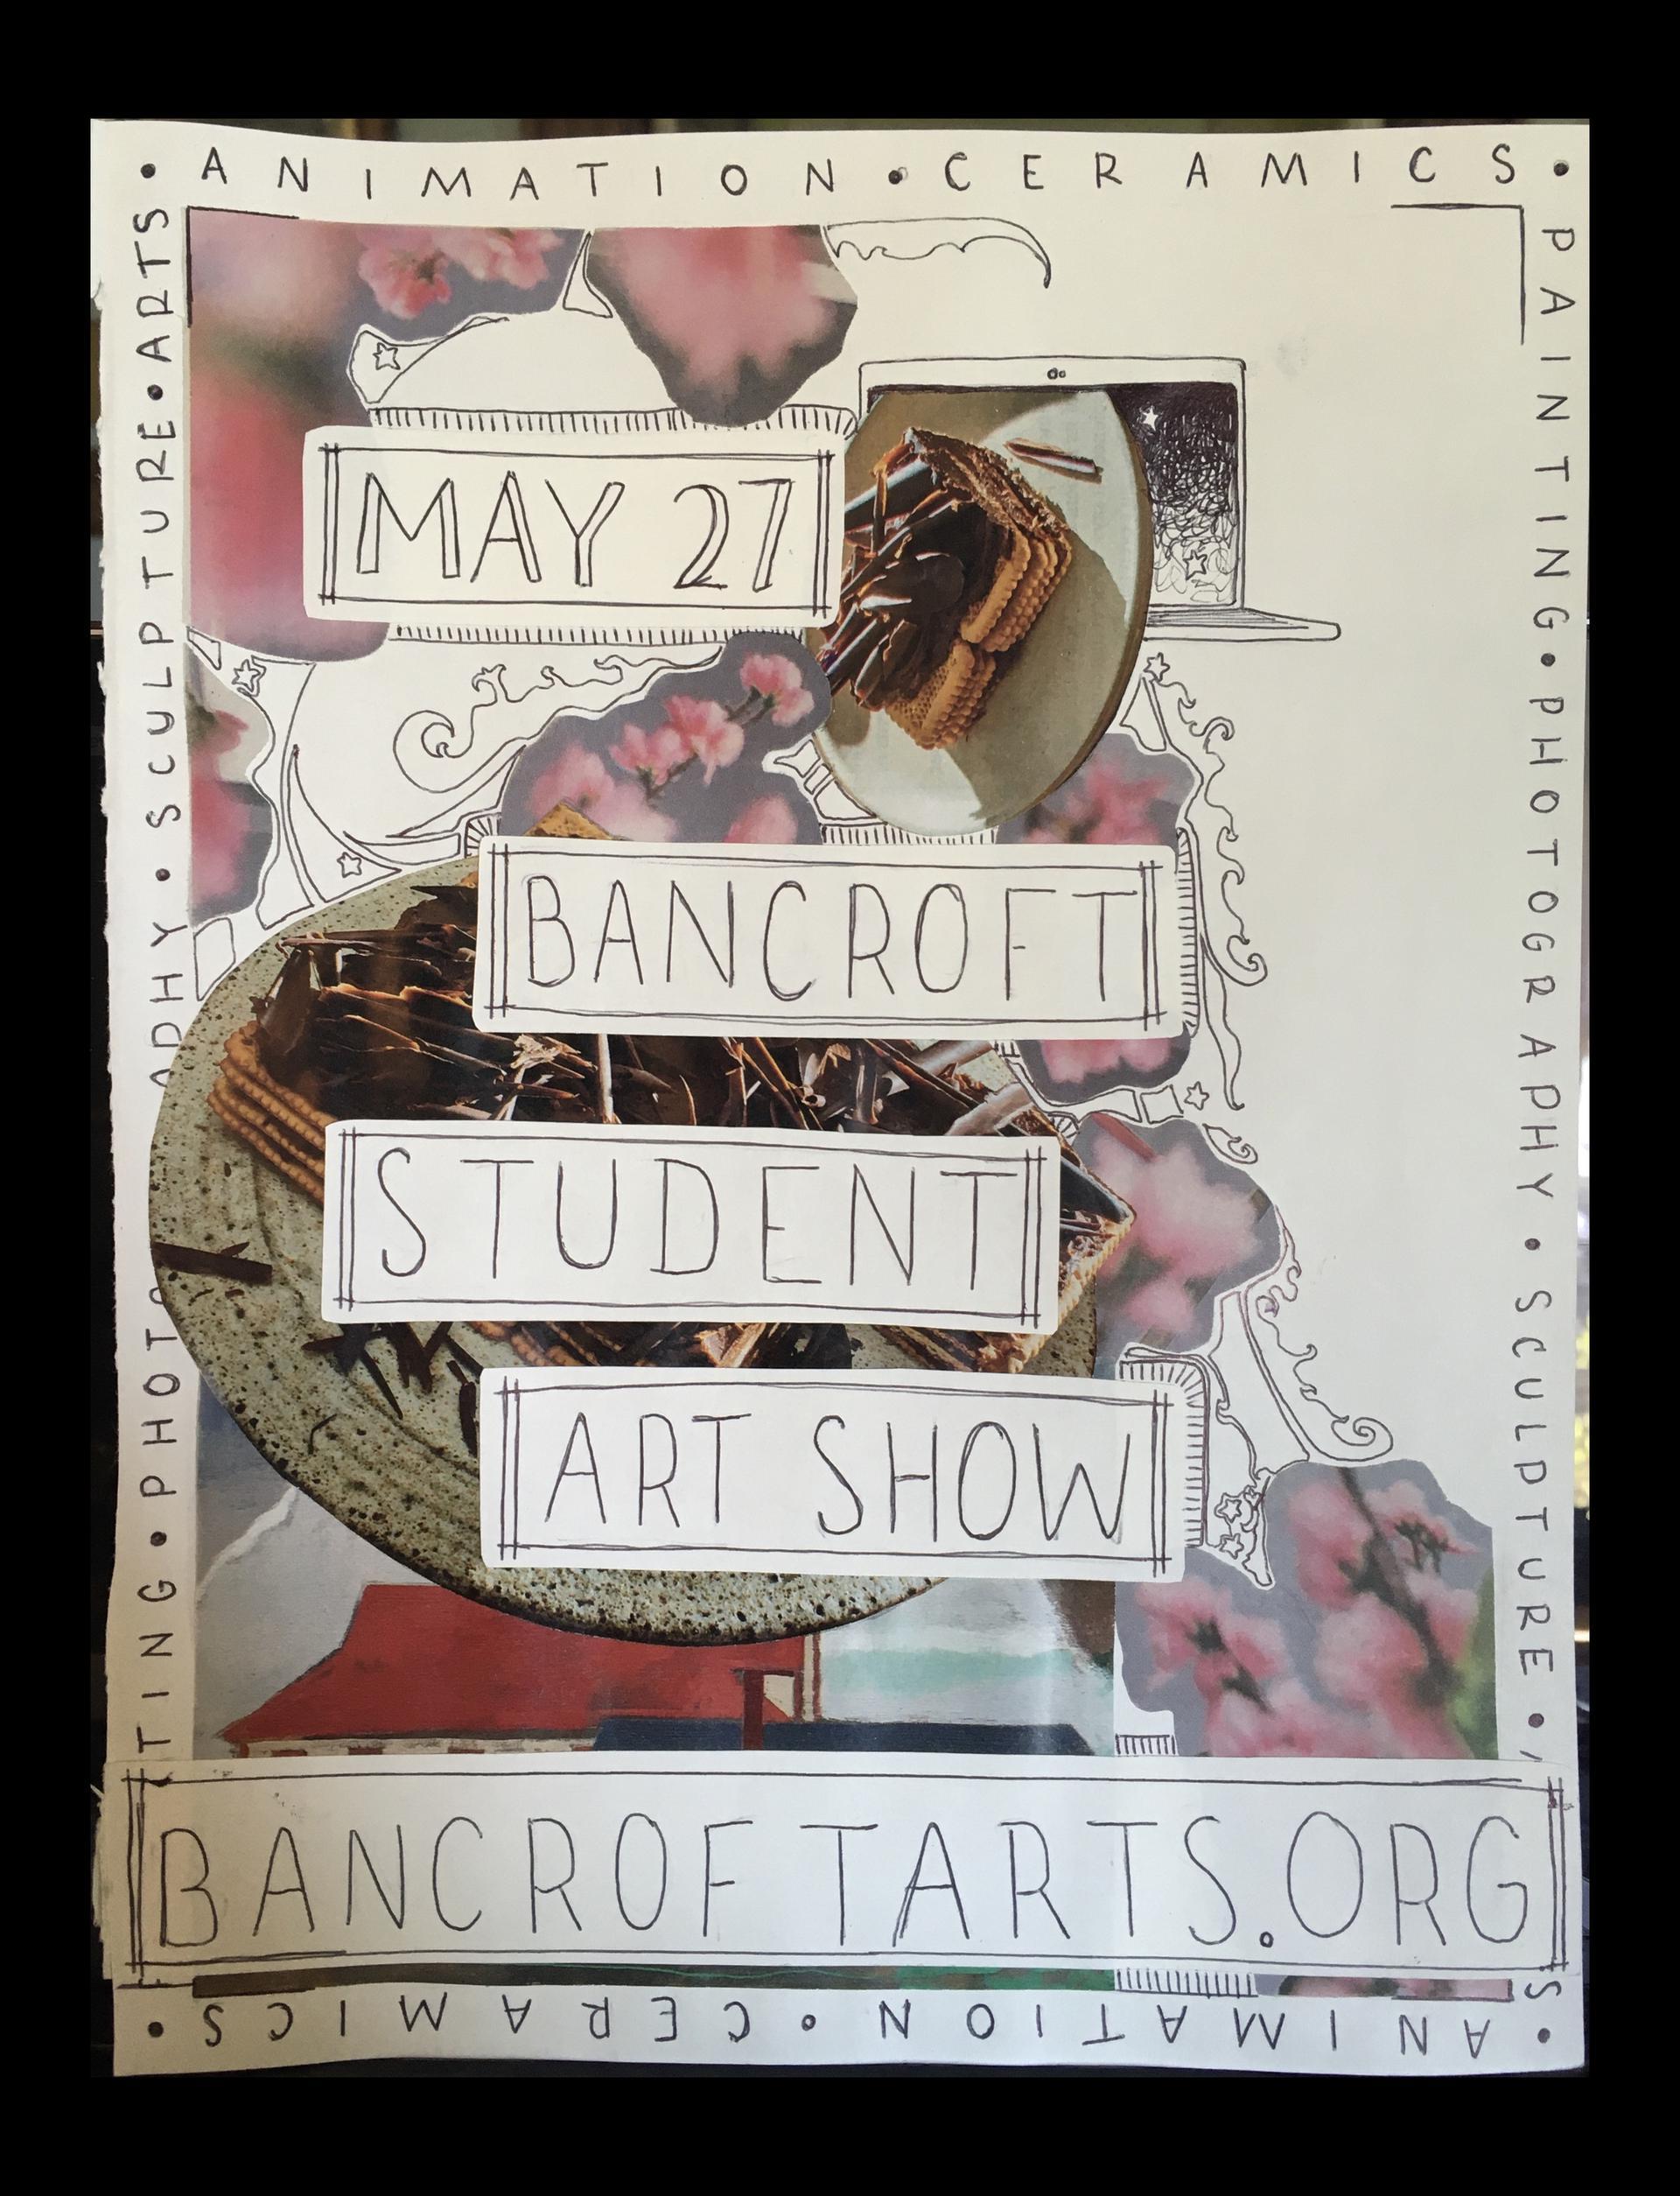 Bancroft Student Visual Art Show